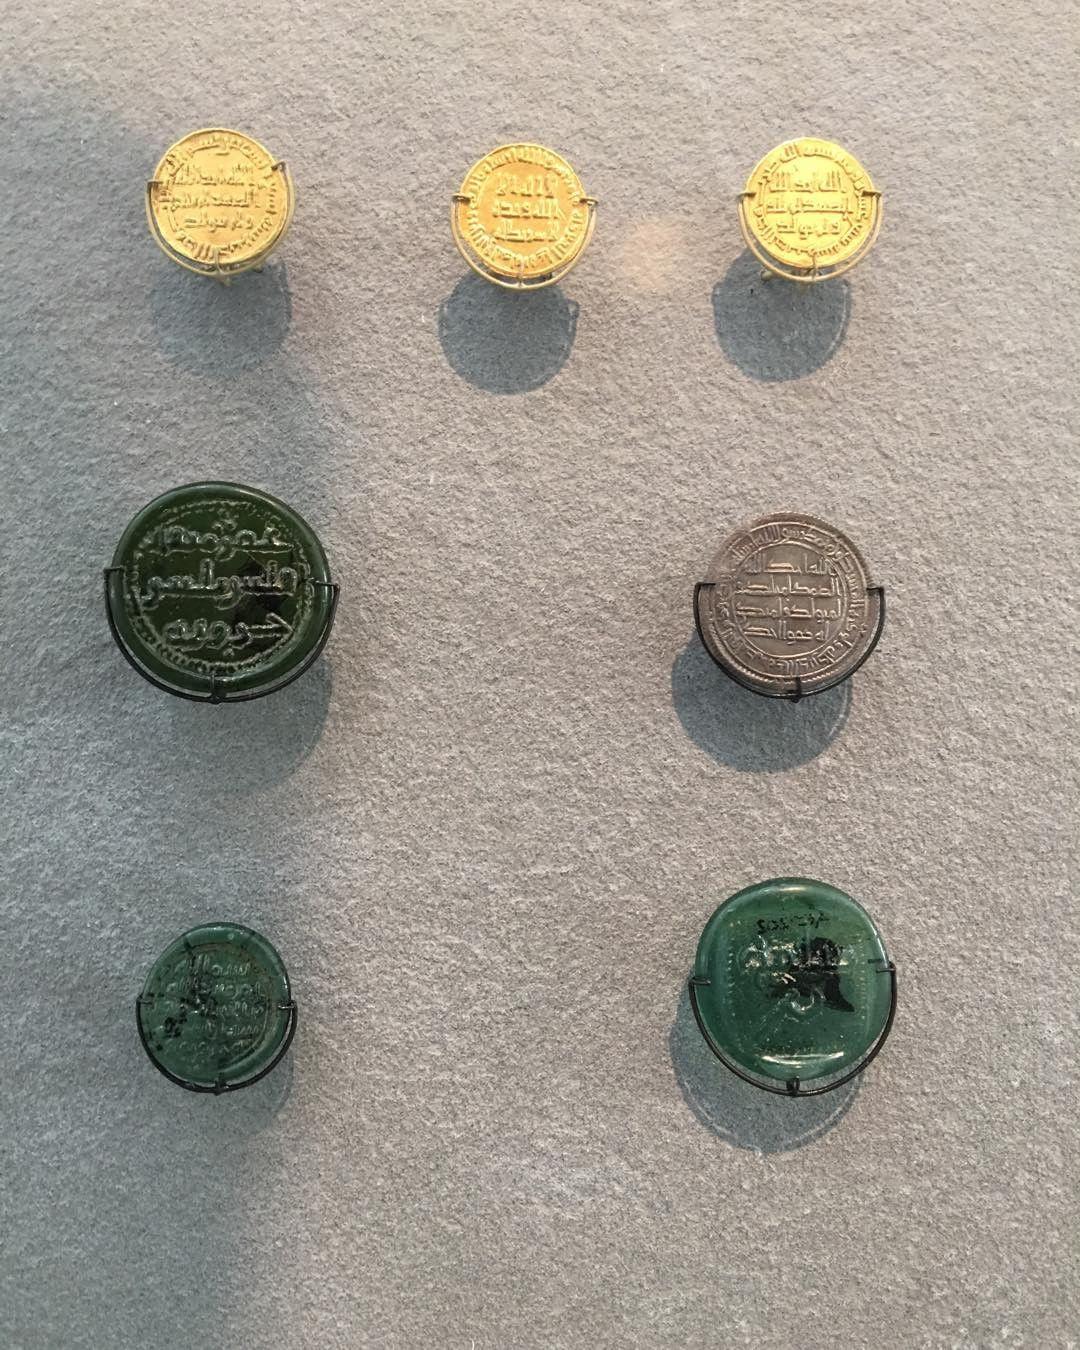 Khat Diwani Ajhalawani/Amr عملات معدنية وجدت في مصر في القرن السابع من الميلاد. #متحف_اللوفر #باريس #فرنسا… 35